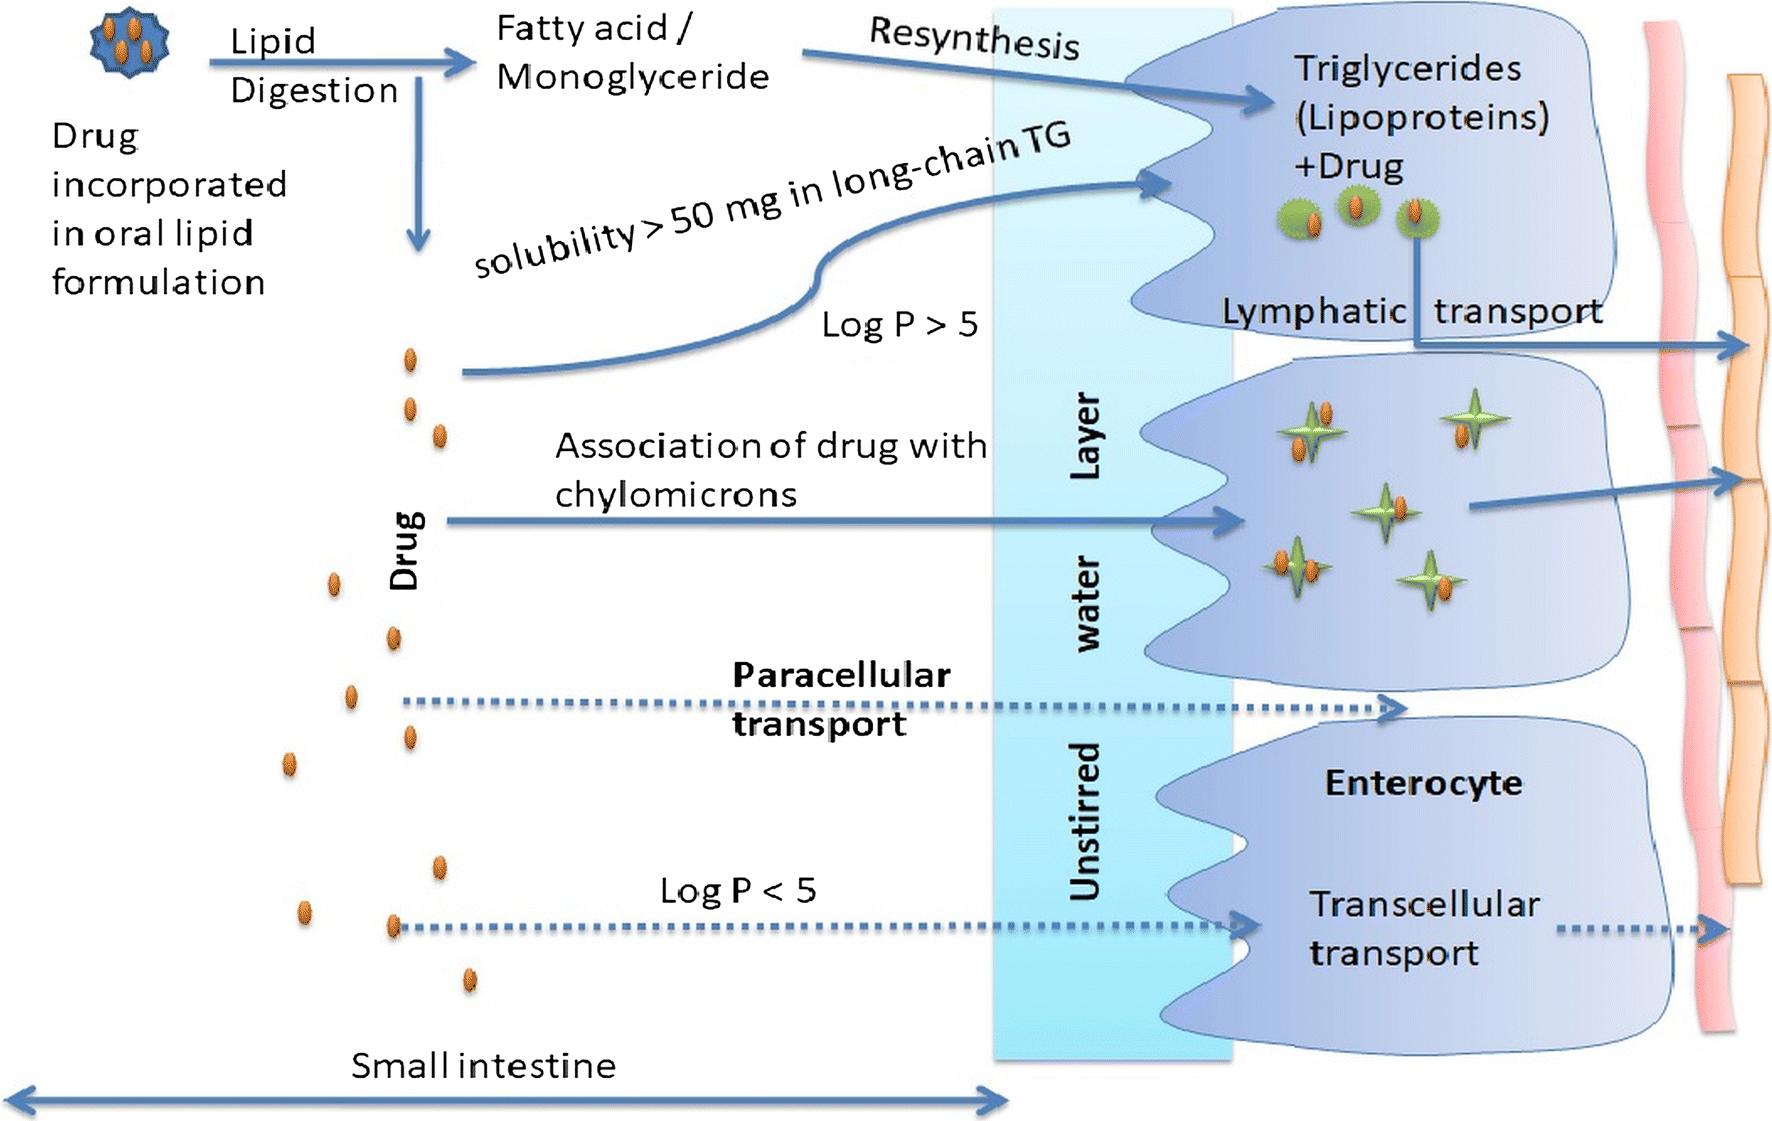 Lipid-Based Oral Formulation Strategies for Lipophilic Drugs